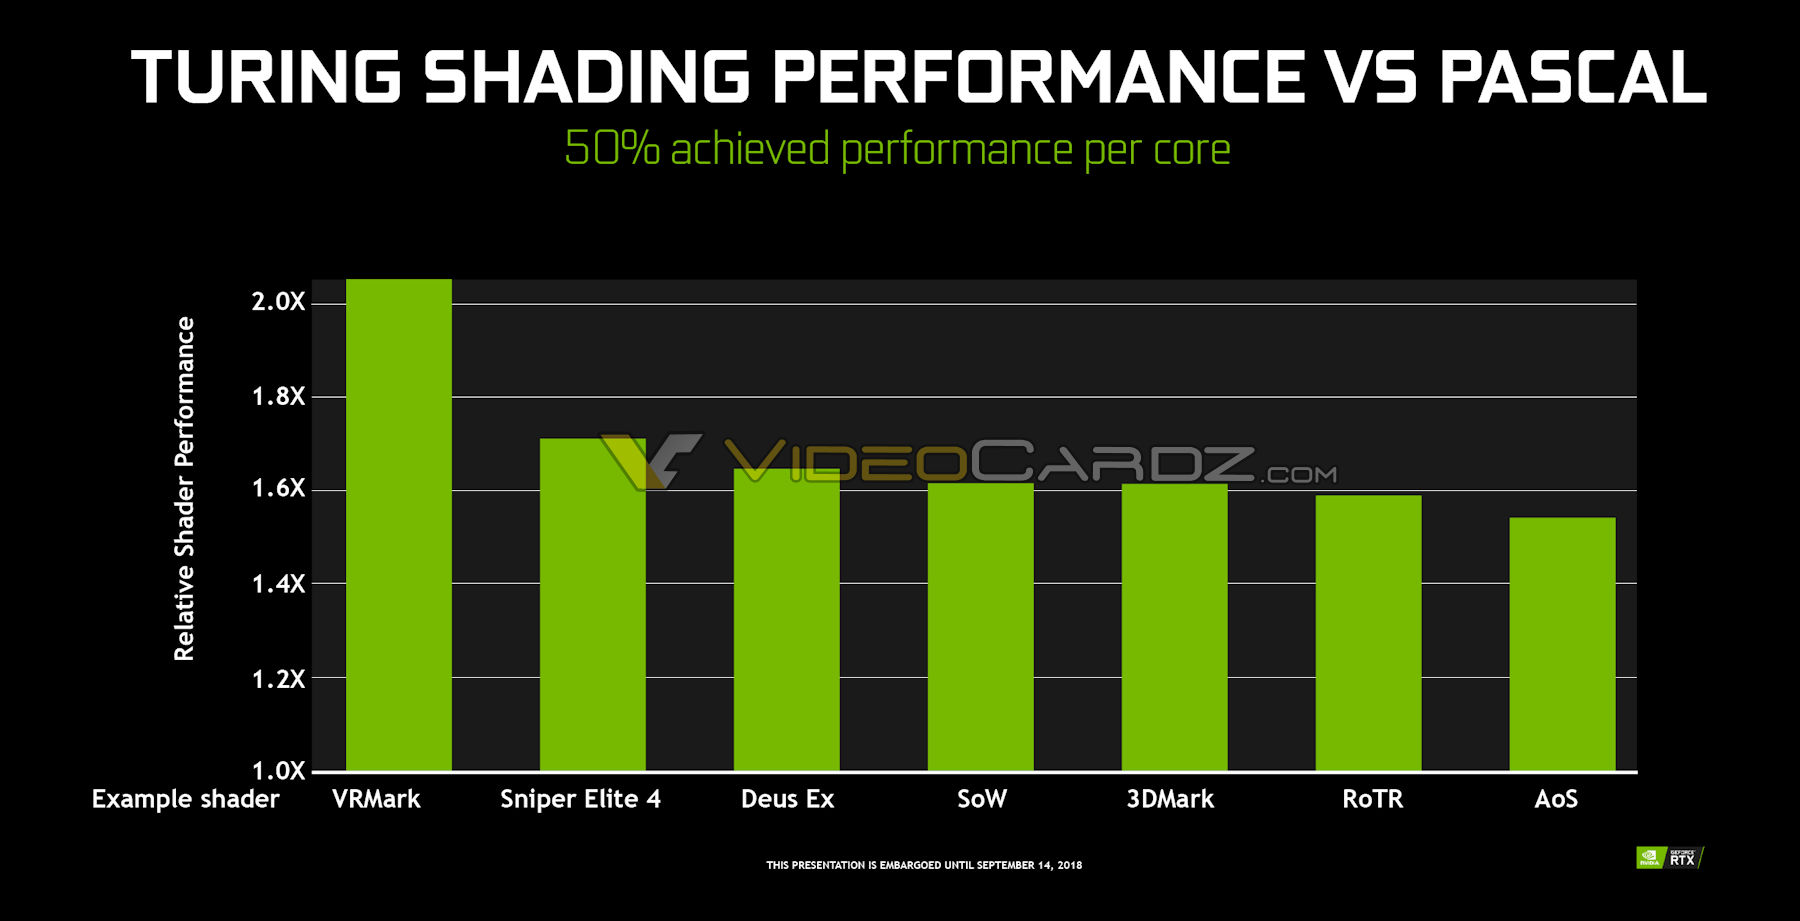 NVIDIA Turing TU102 GPU For GeForce RTX 2080 Ti Has 50% Better Per